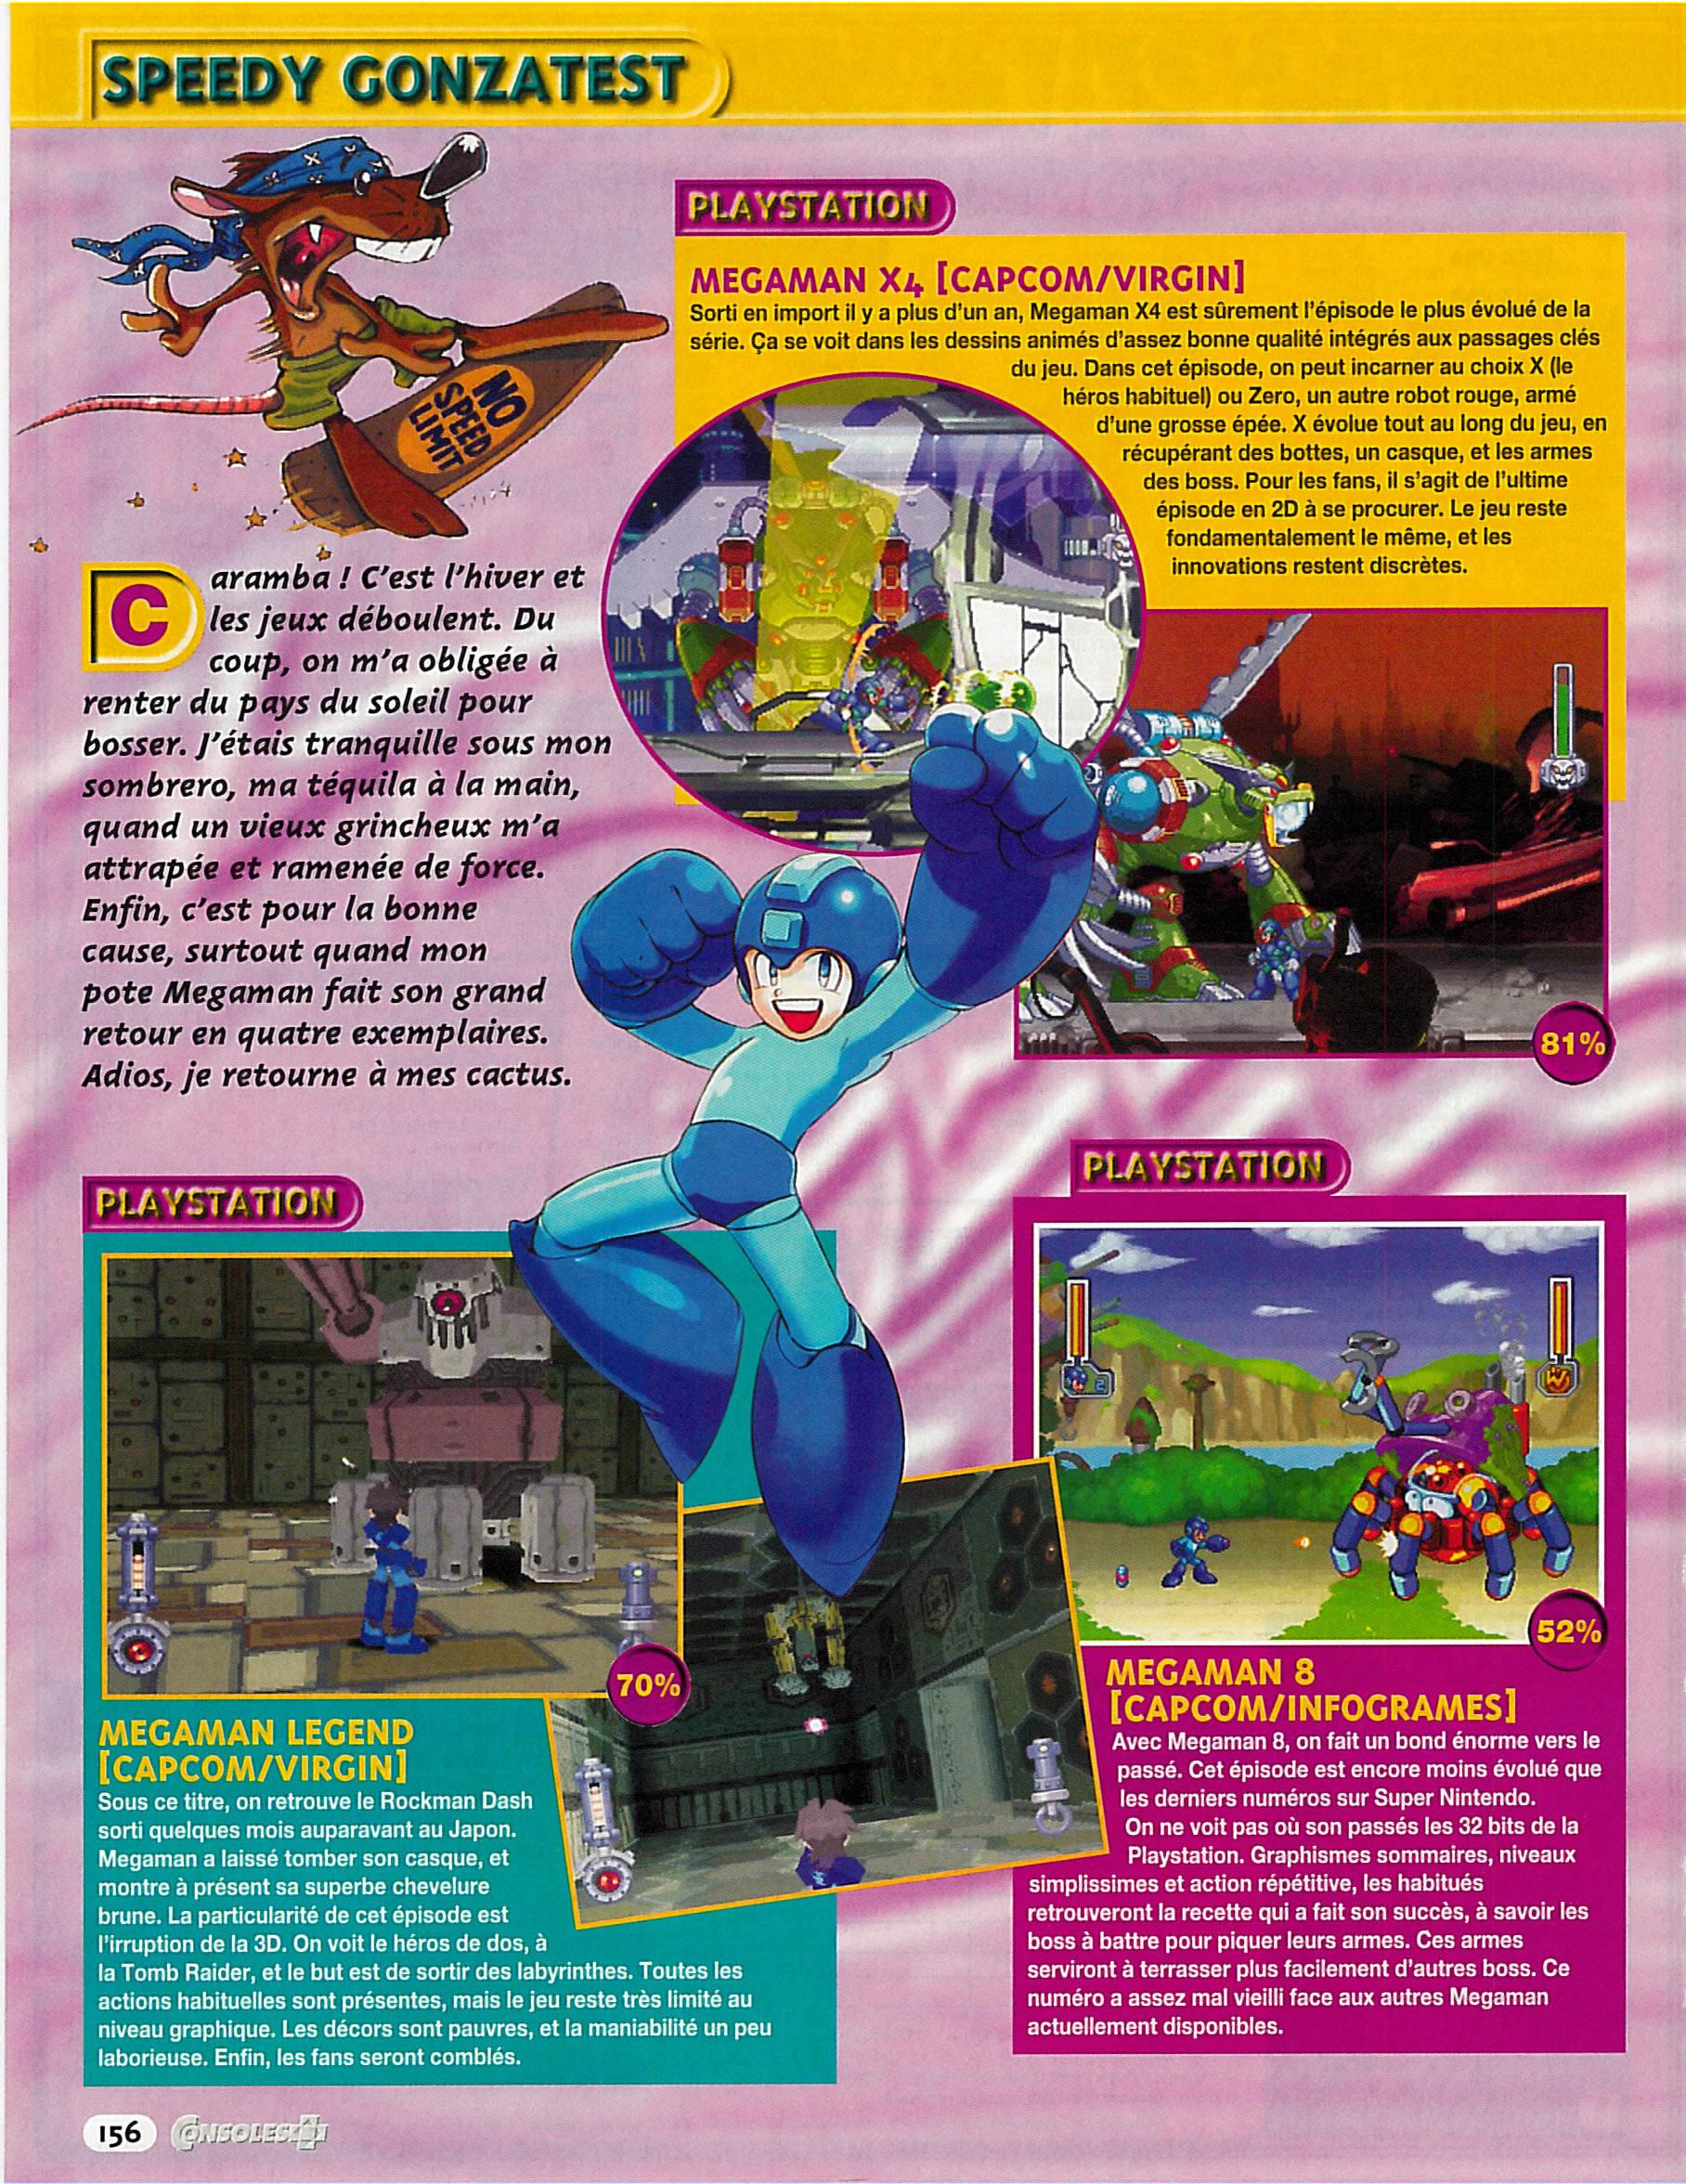 Mega Man X4 for PlayStation (1997) MobyRank - MobyGames